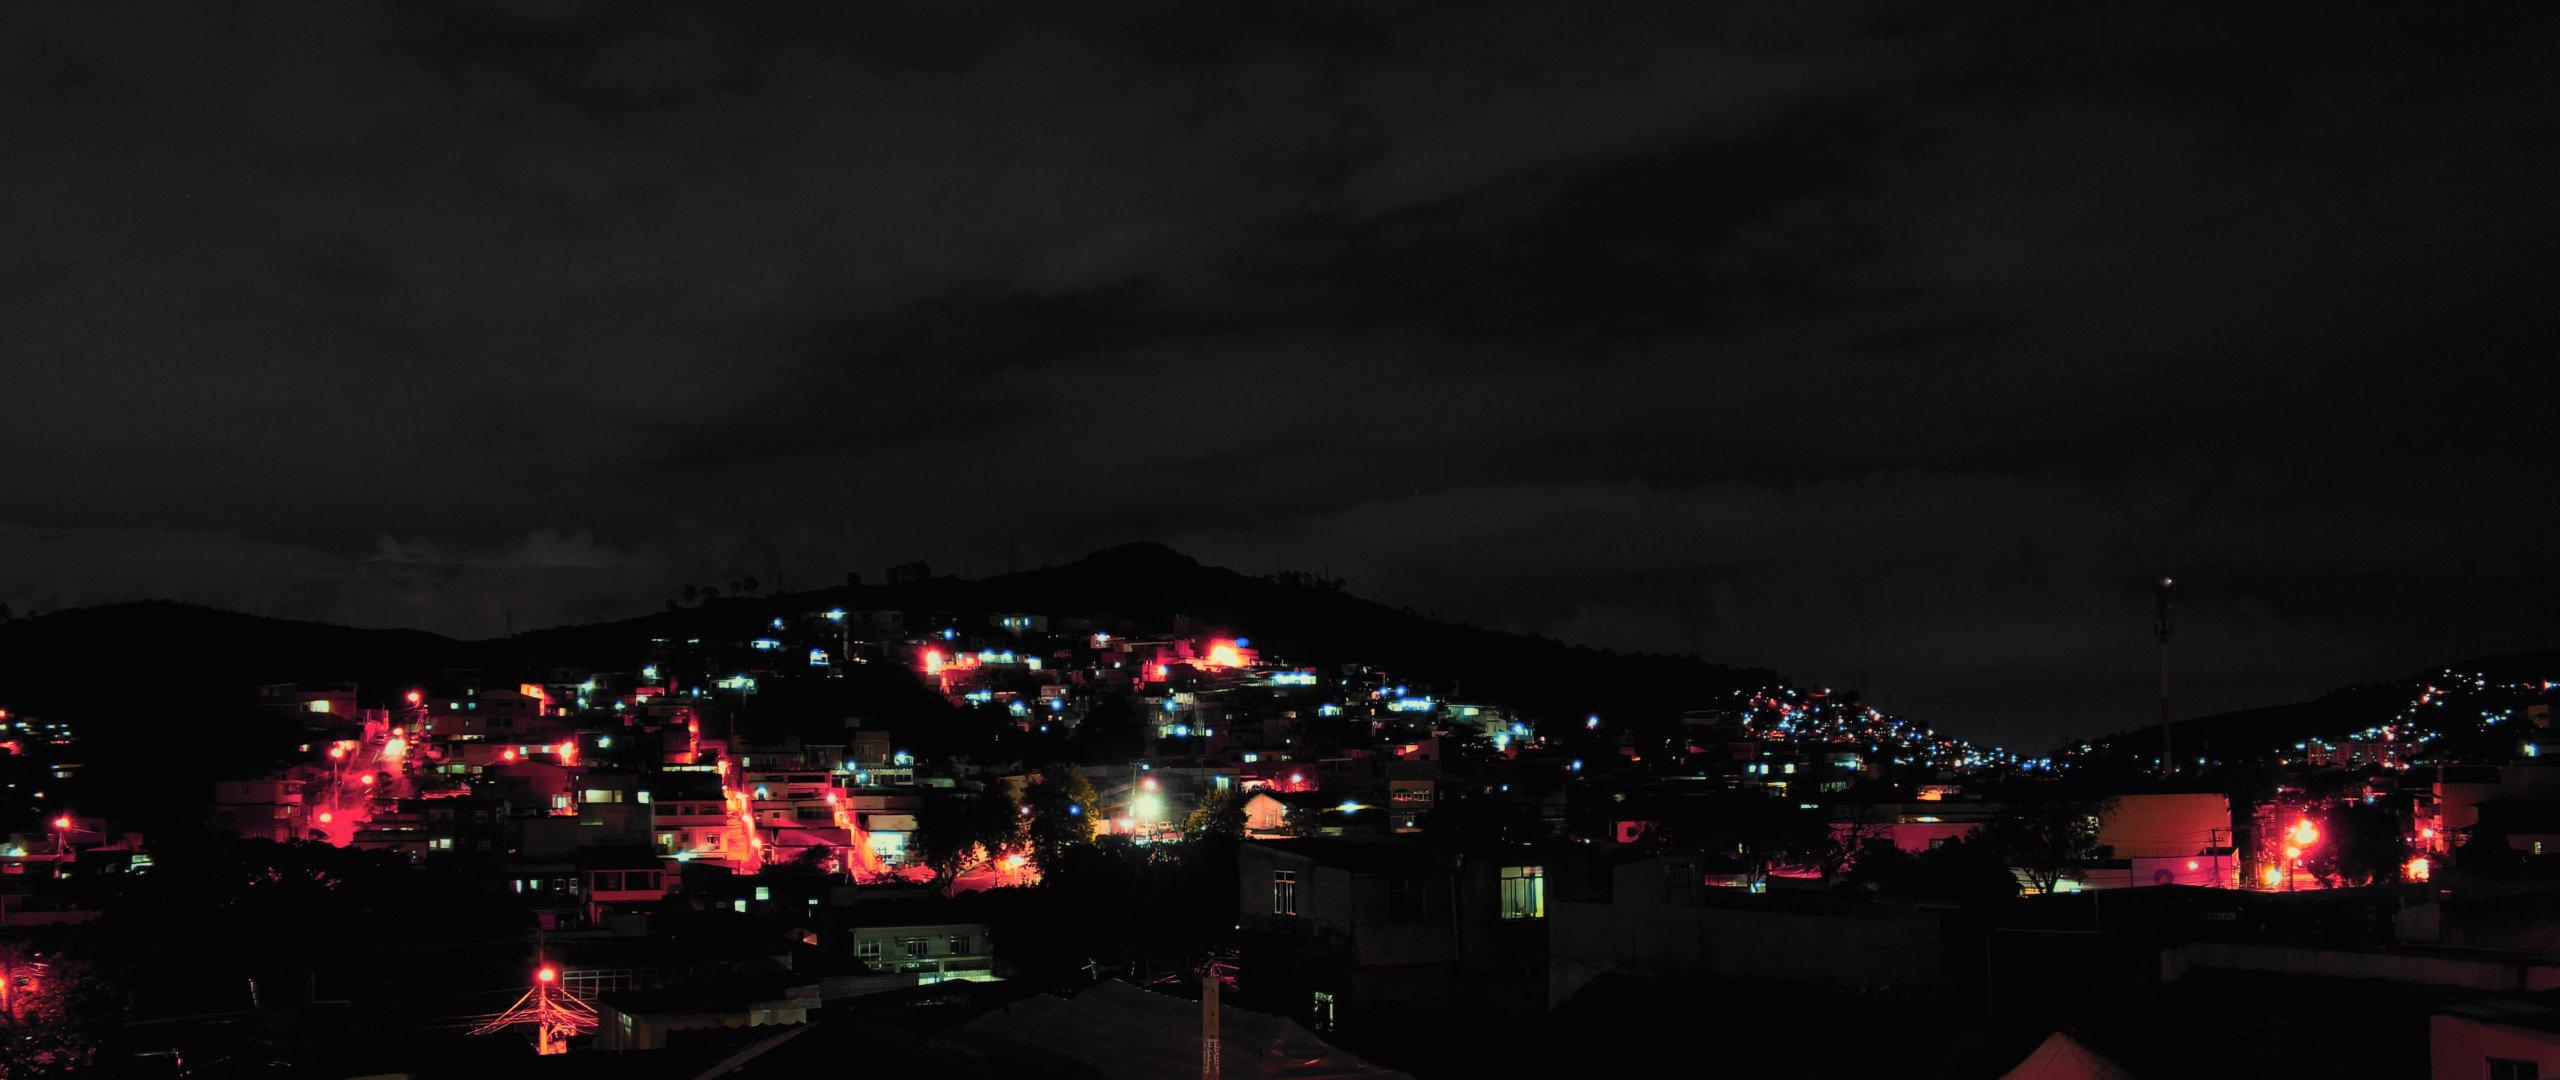 Late Night City Lights Hd Wallpaper